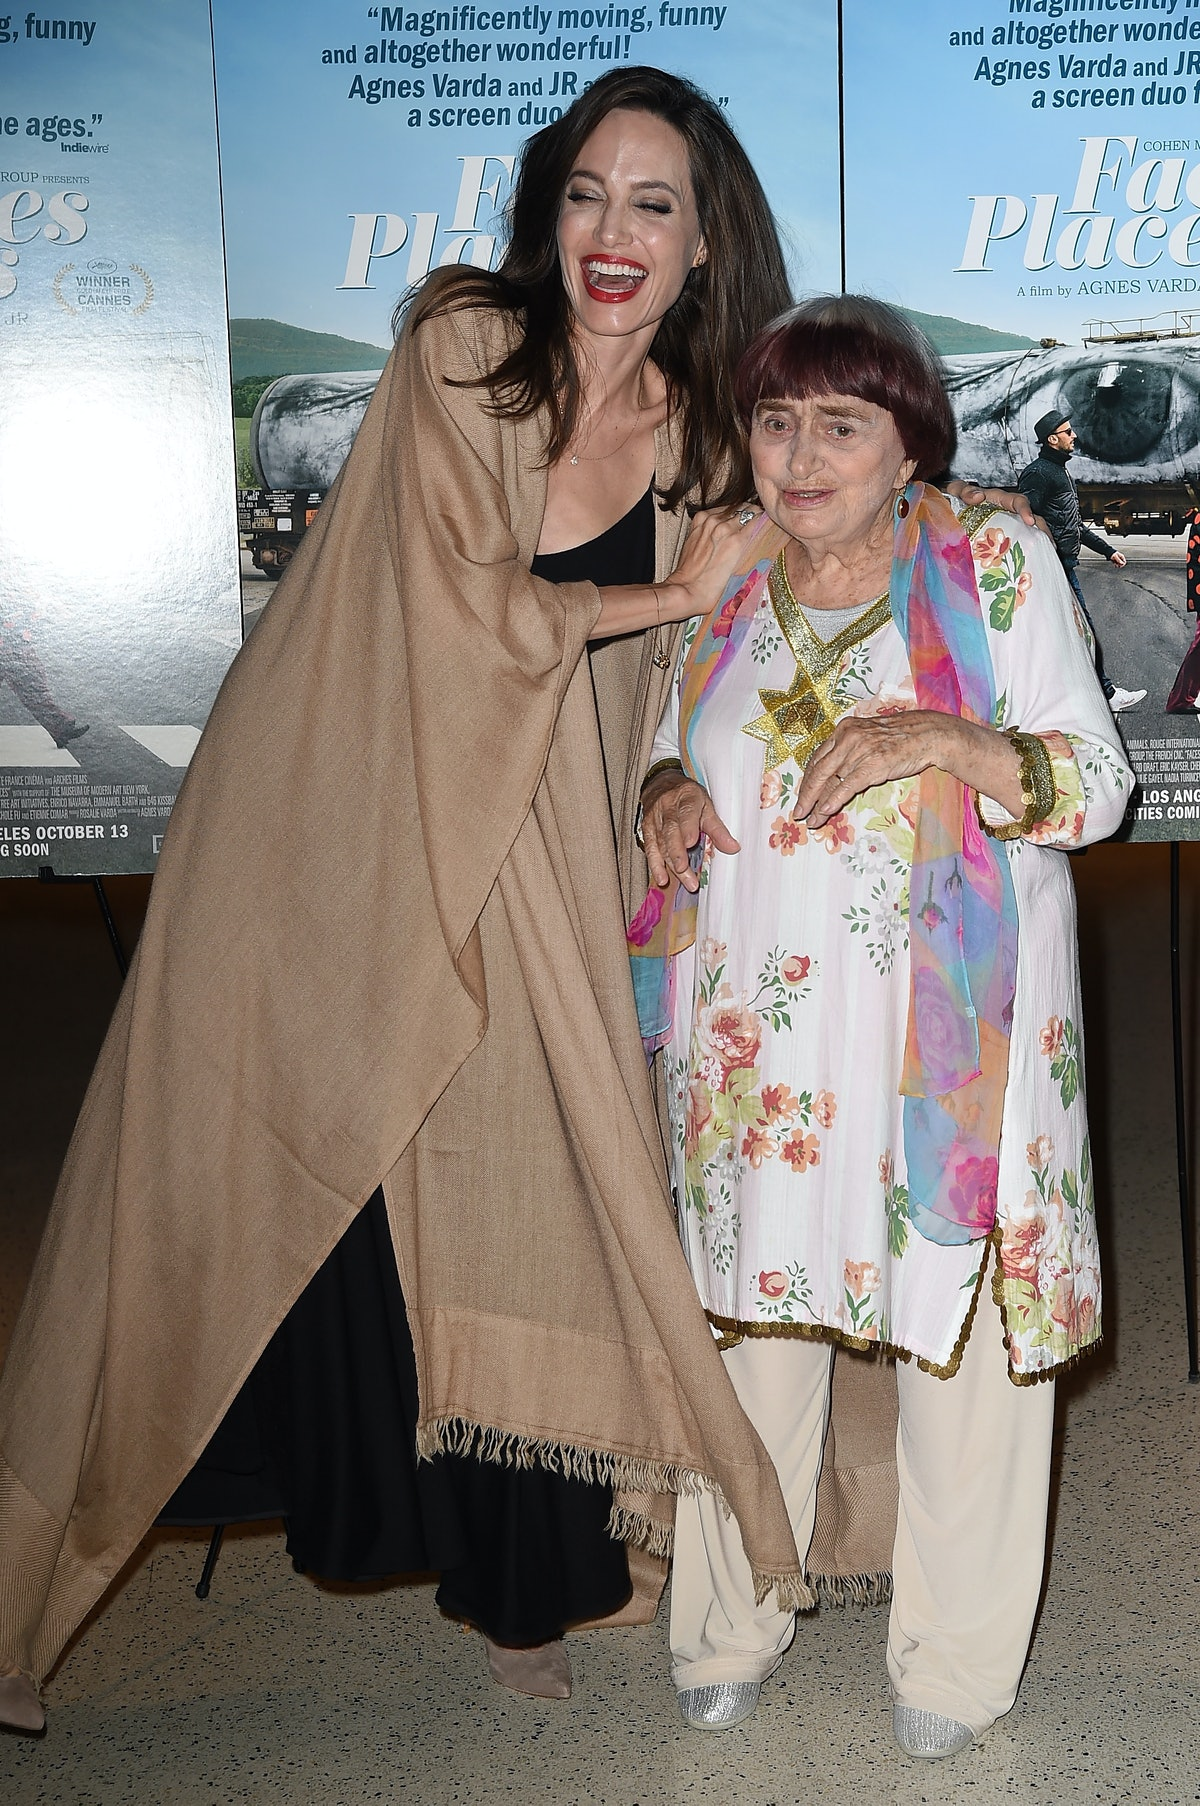 Angelina Jolie and Agnès Varda